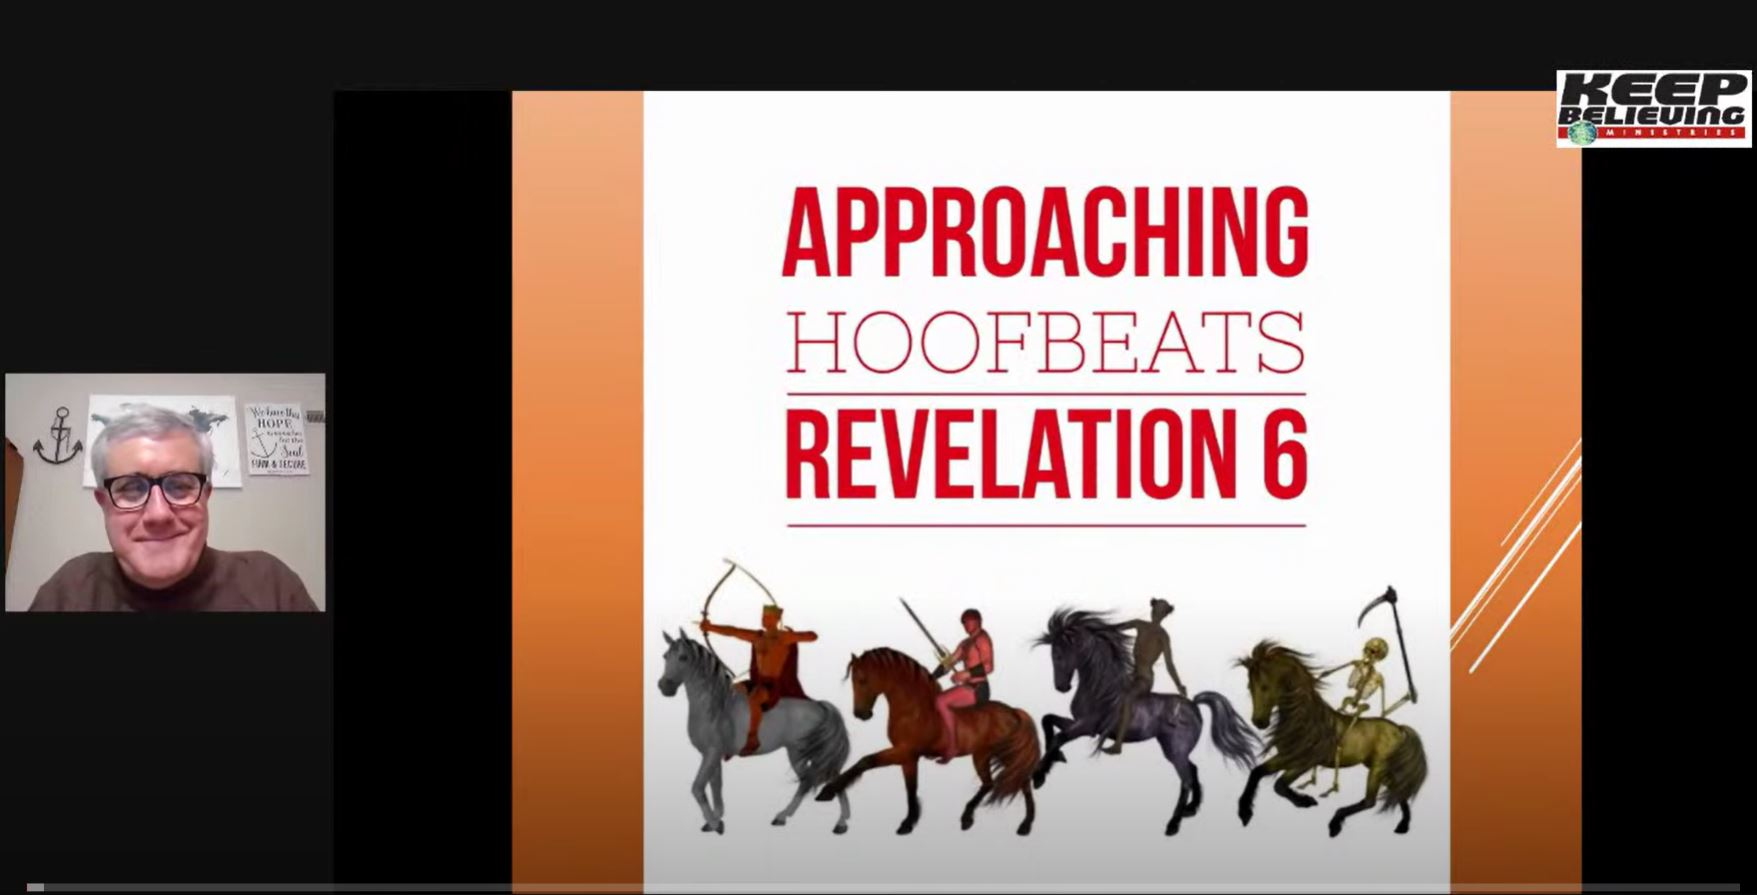 Approaching Hoofbeats (Revelation 6)